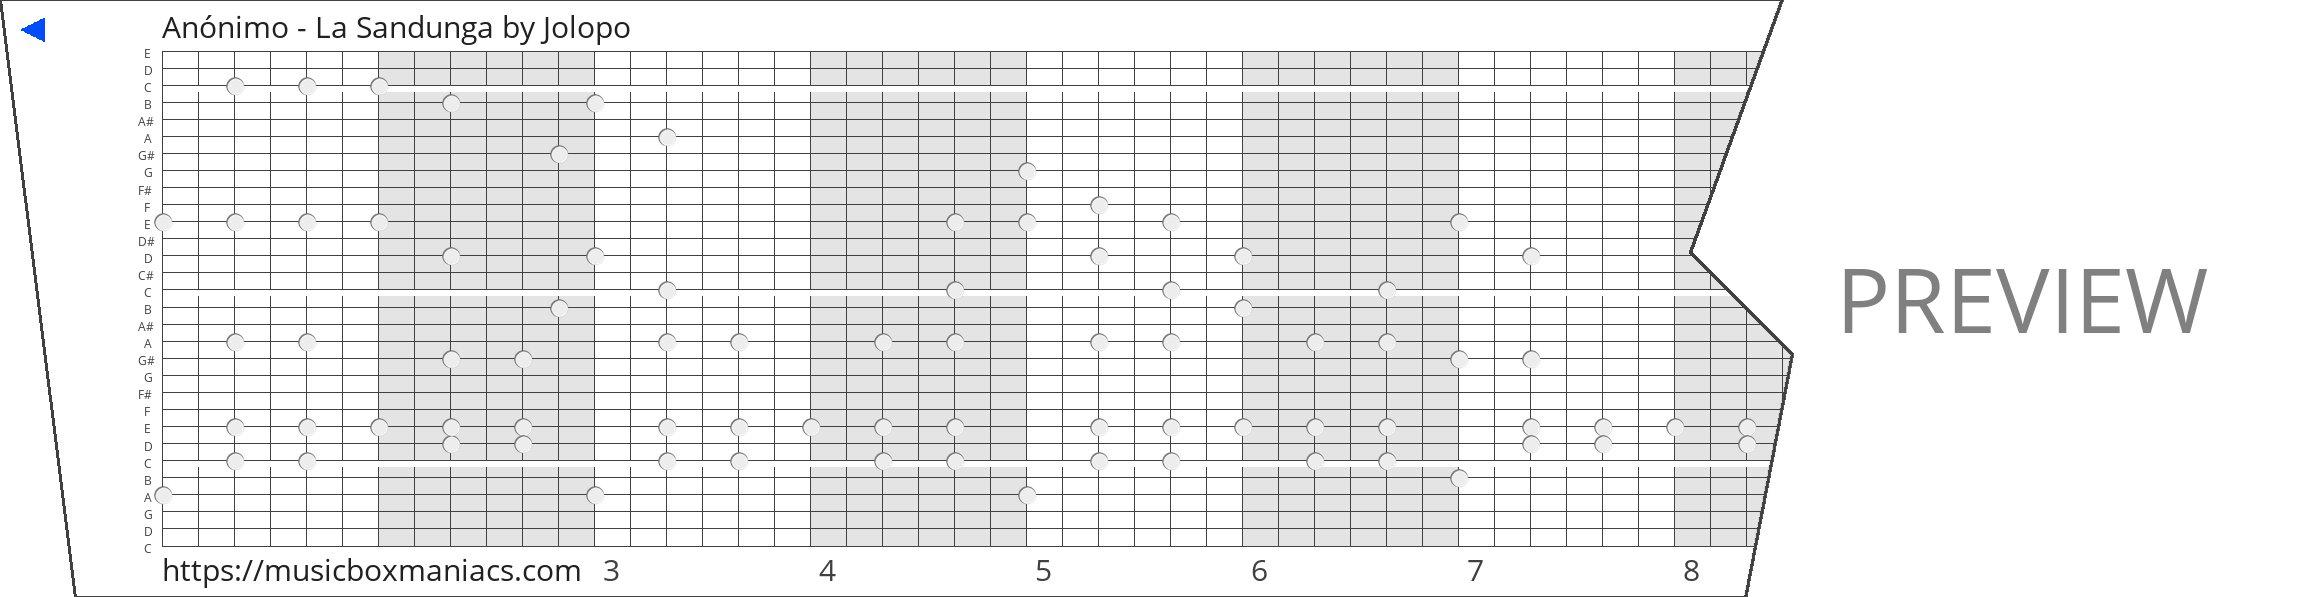 Anónimo - La Sandunga 30 note music box paper strip